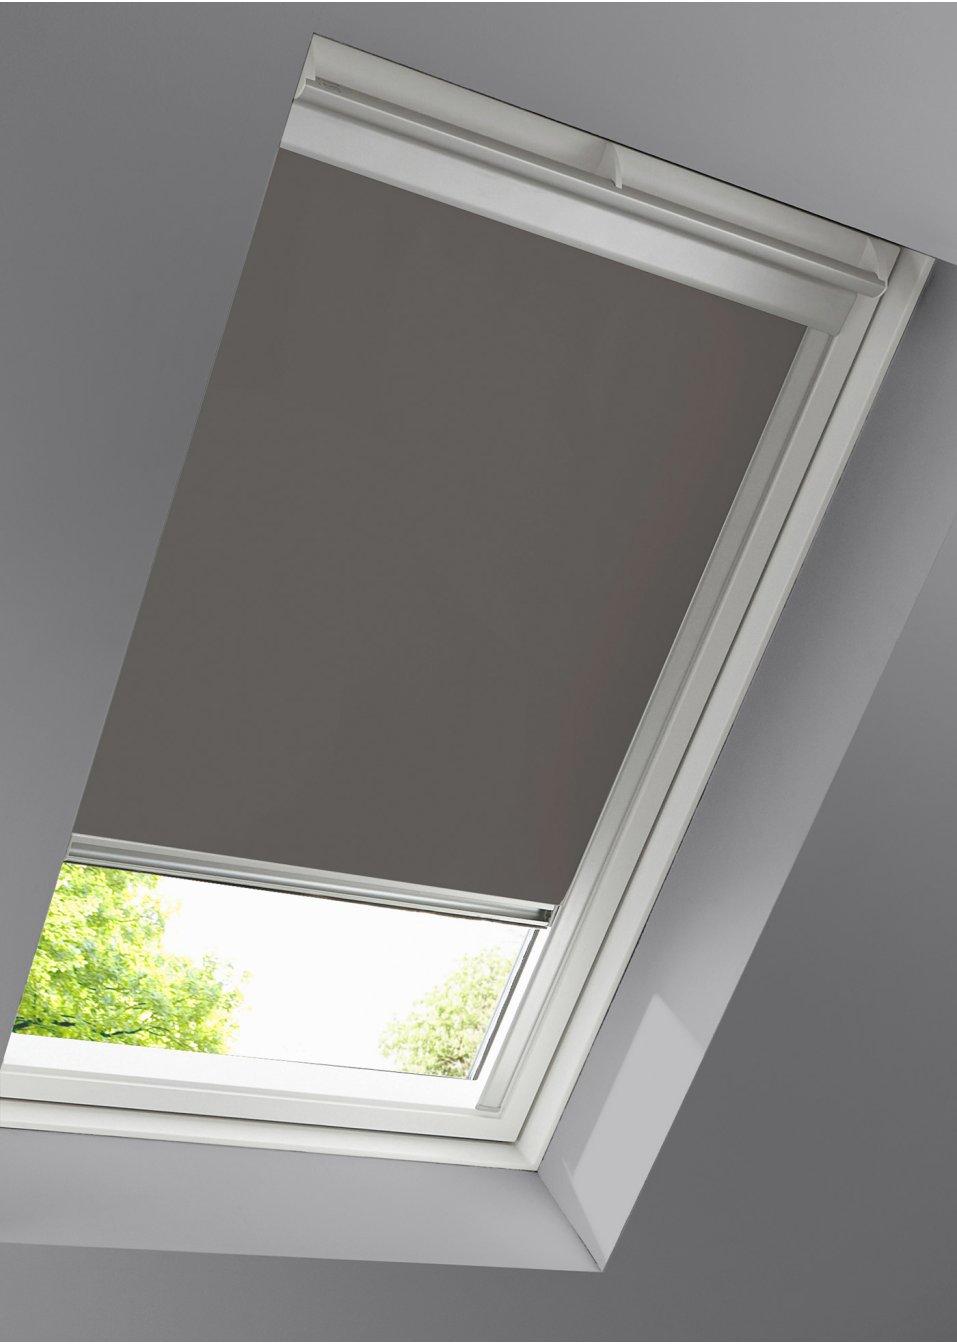 dachfenster rollo verdunkelung taupe wohnen bpc living. Black Bedroom Furniture Sets. Home Design Ideas